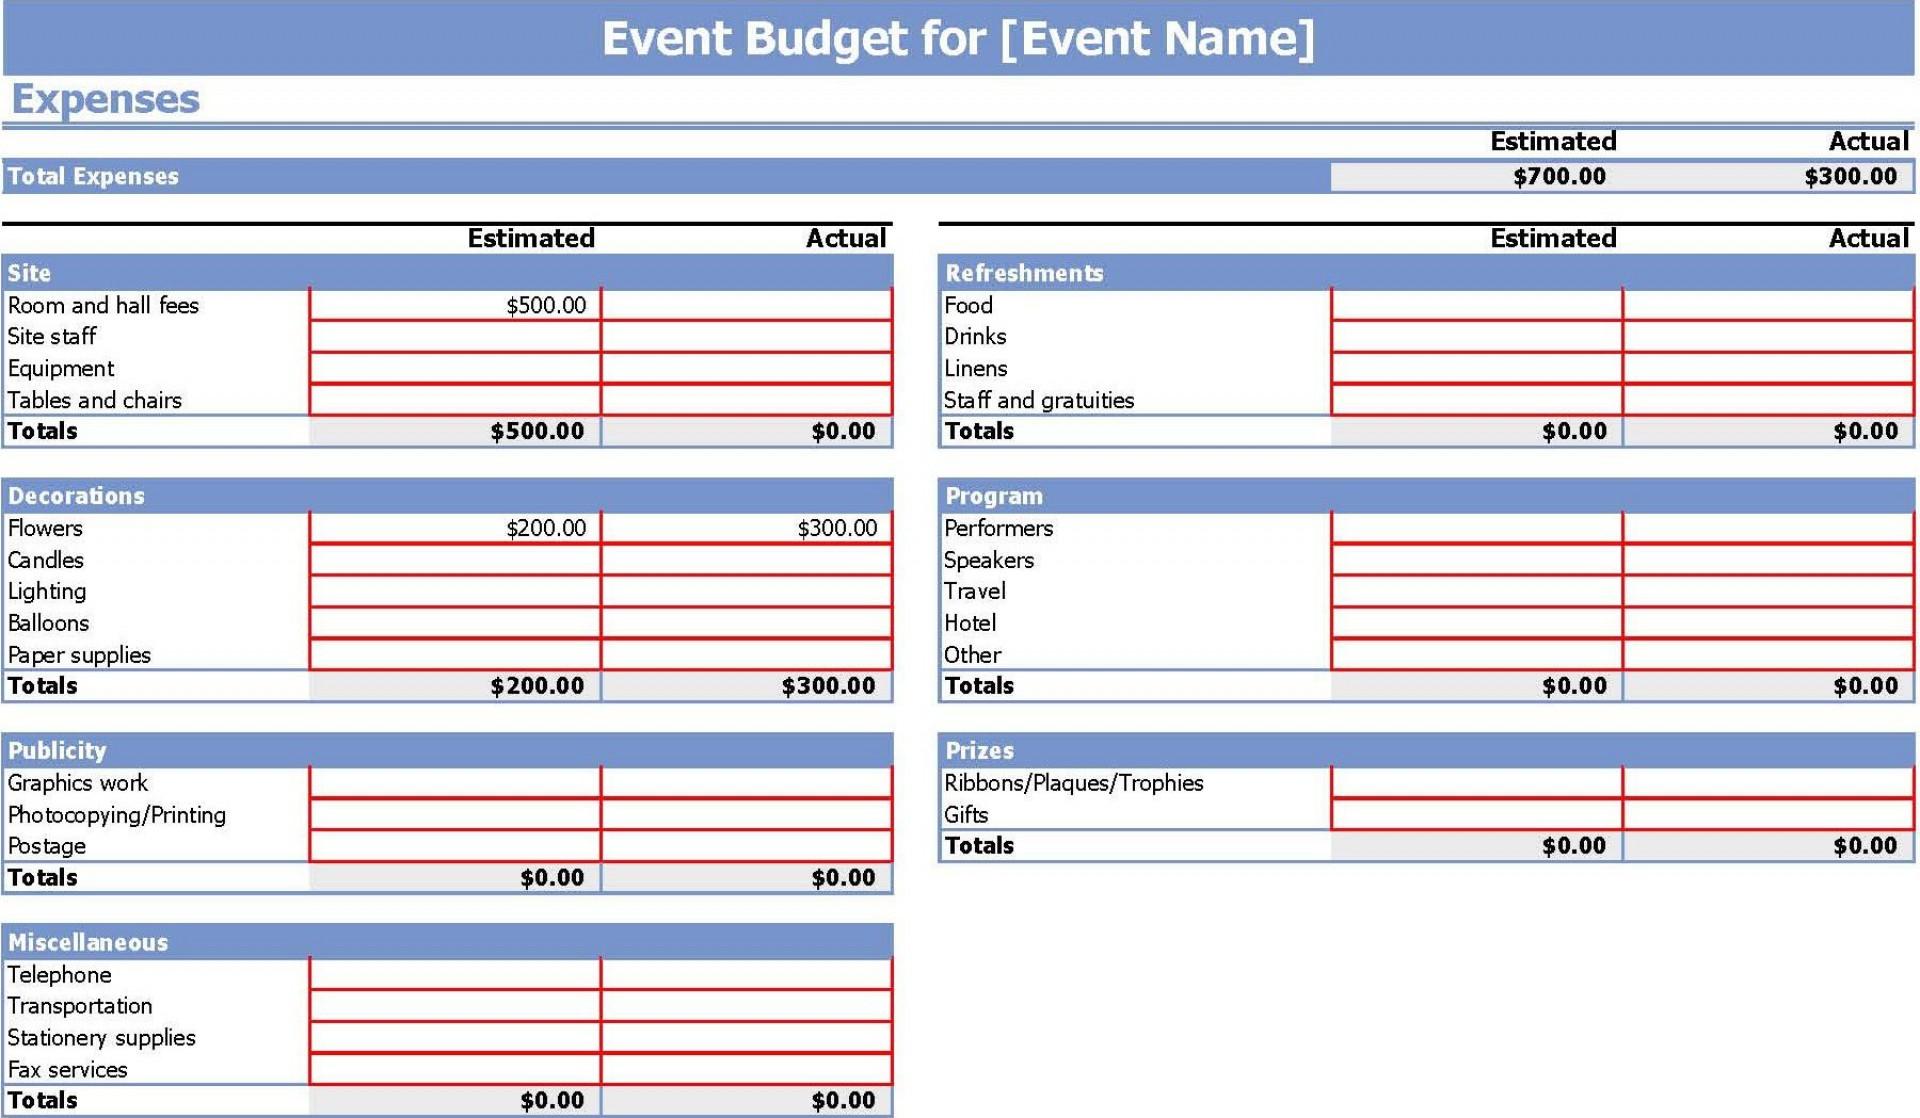 006 Stunning Event Planning Budget Worksheet Template Image  Free Download Planner Spreadsheet1920